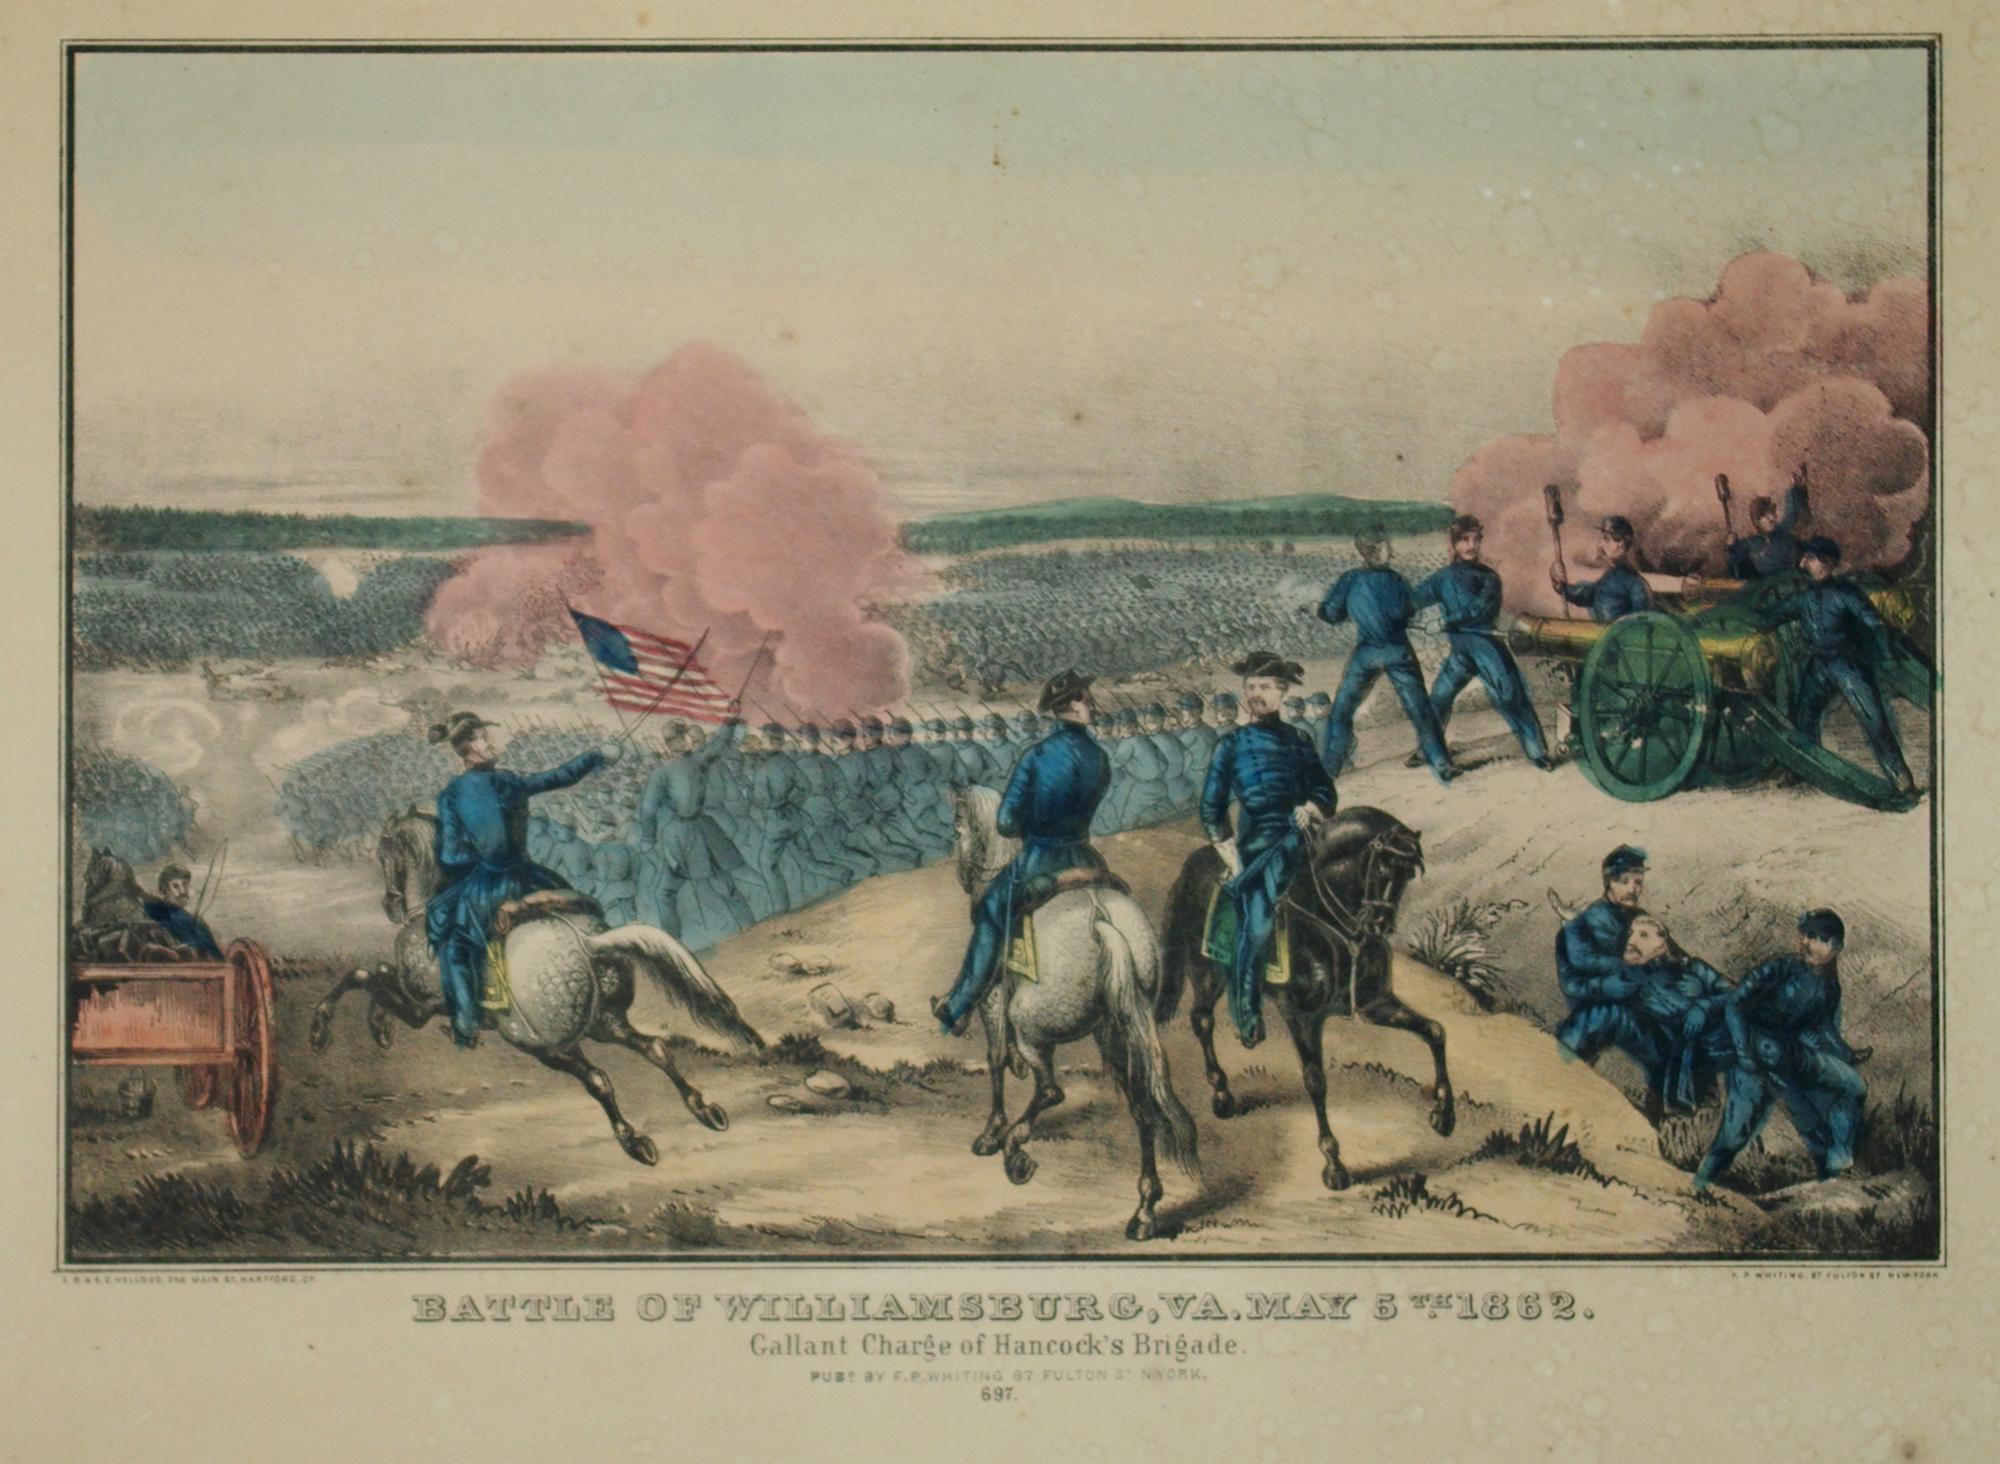 Battle of Williamsburg, VA, May 5th, 1862: E. B. & E. C. Kellogg